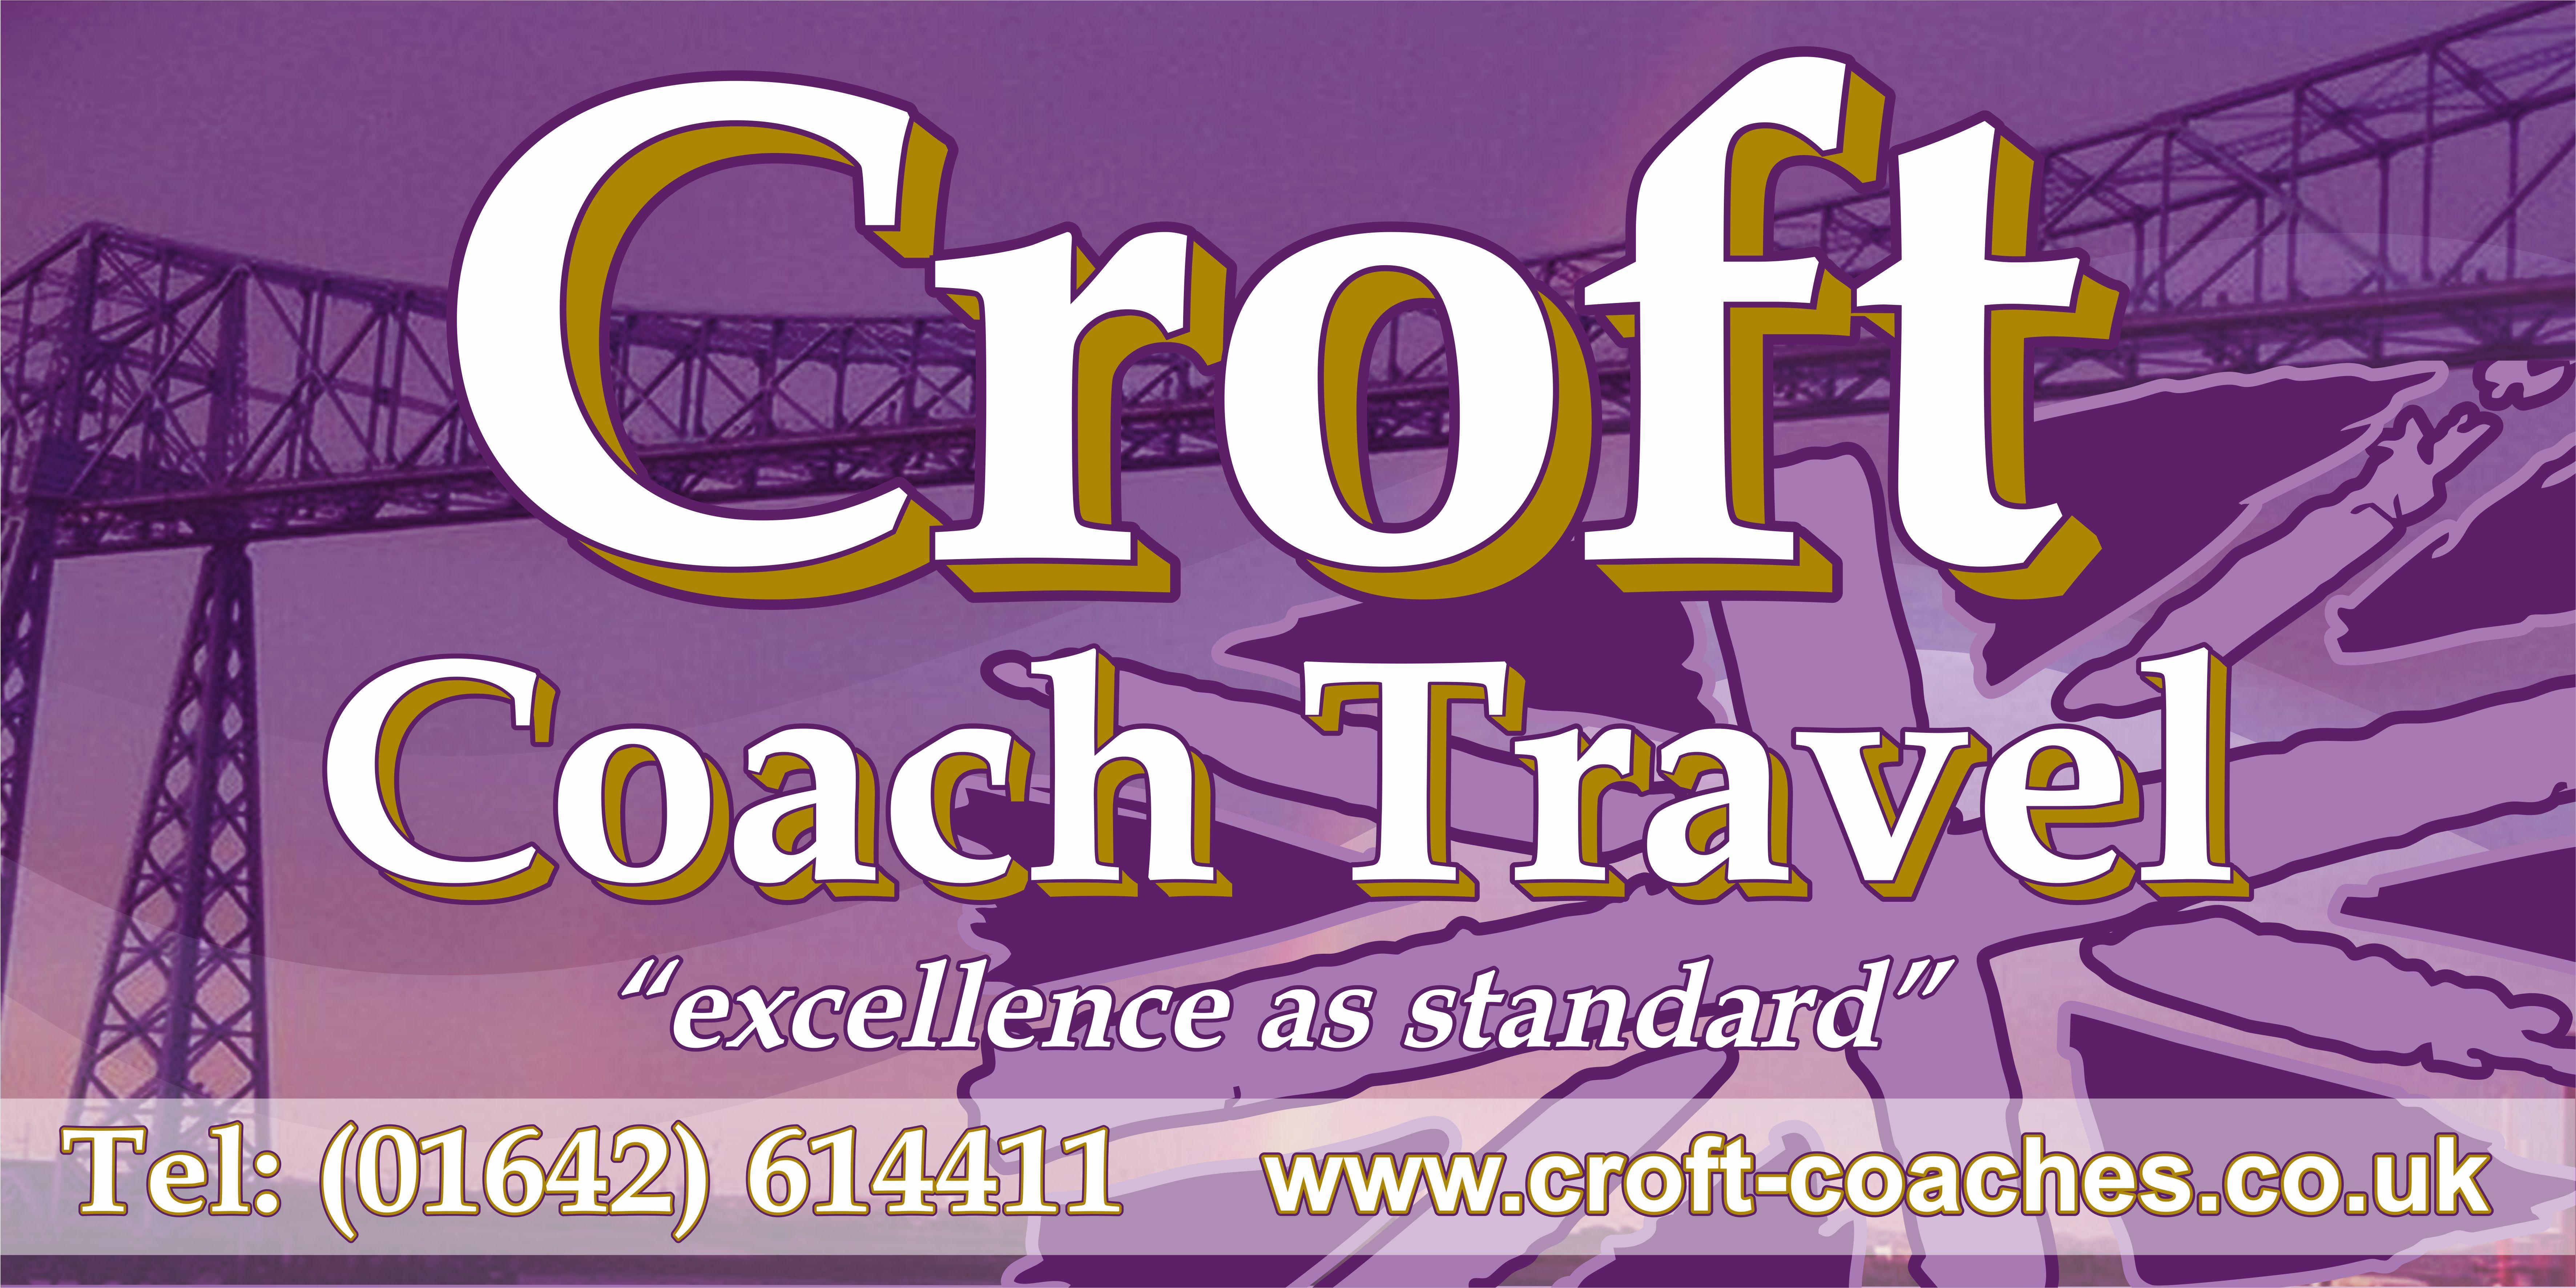 Croft Coach Travel